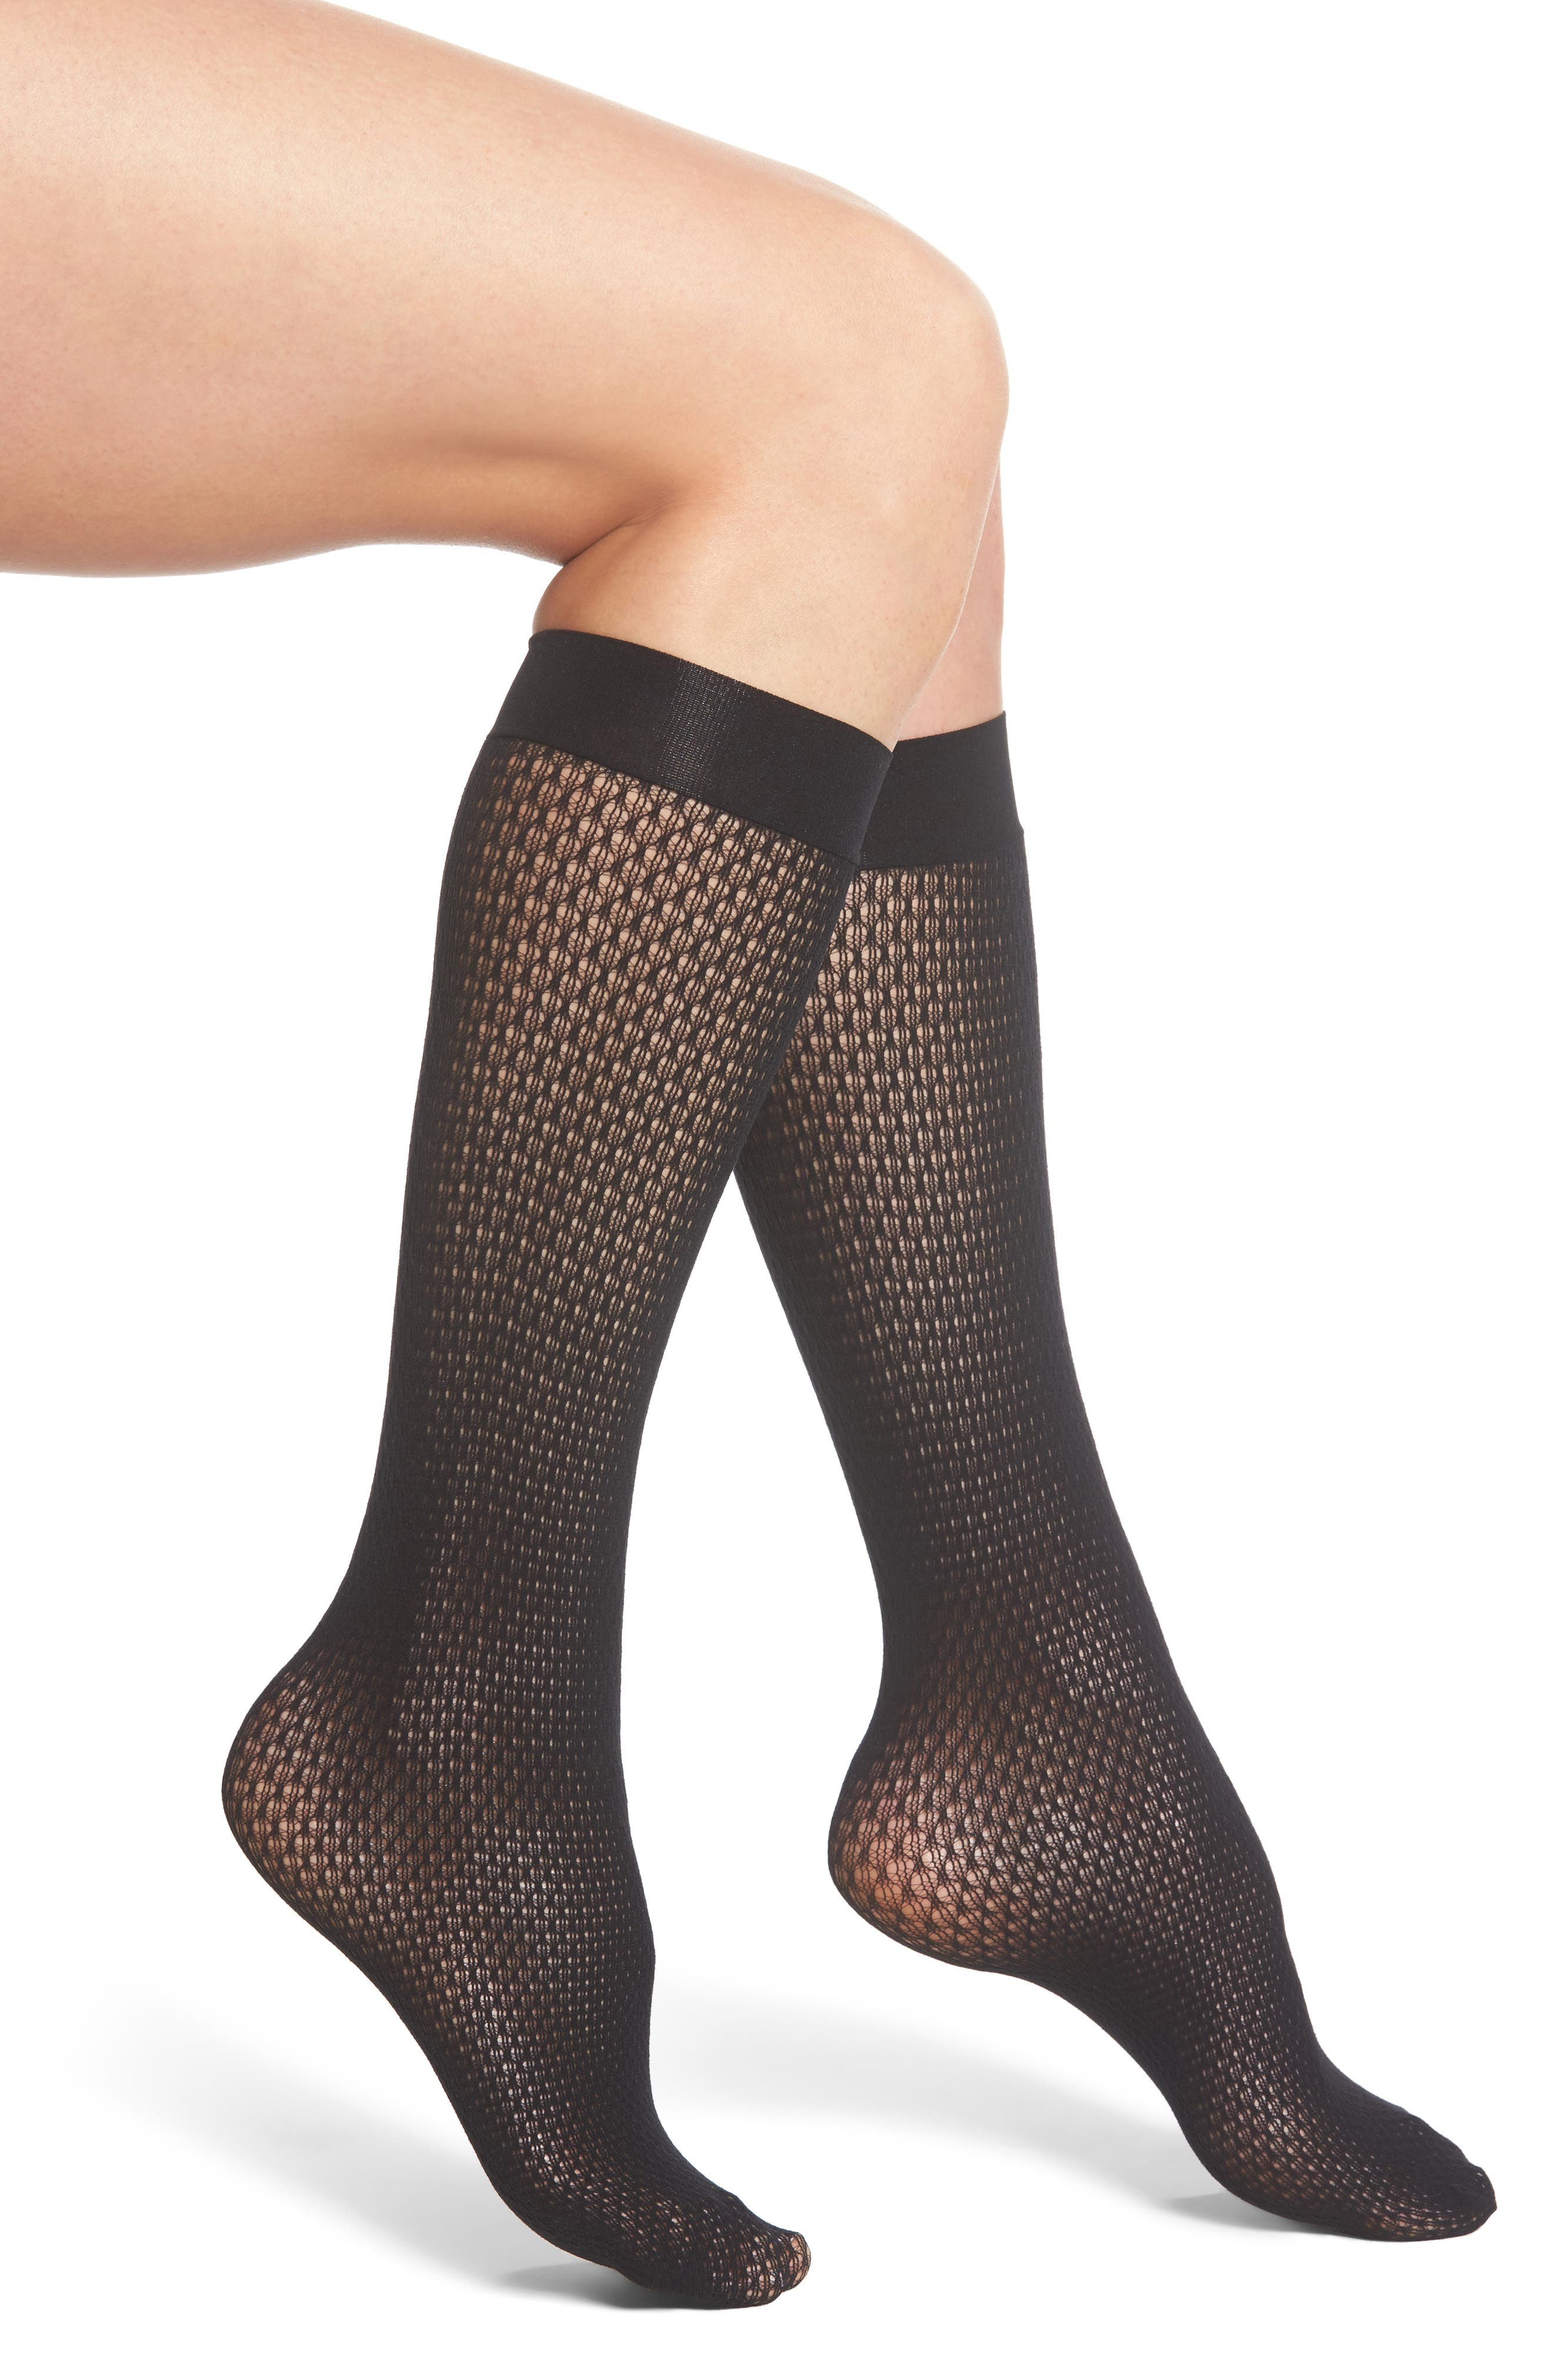 WOLFORD Rhomb Net Knee High Stockings